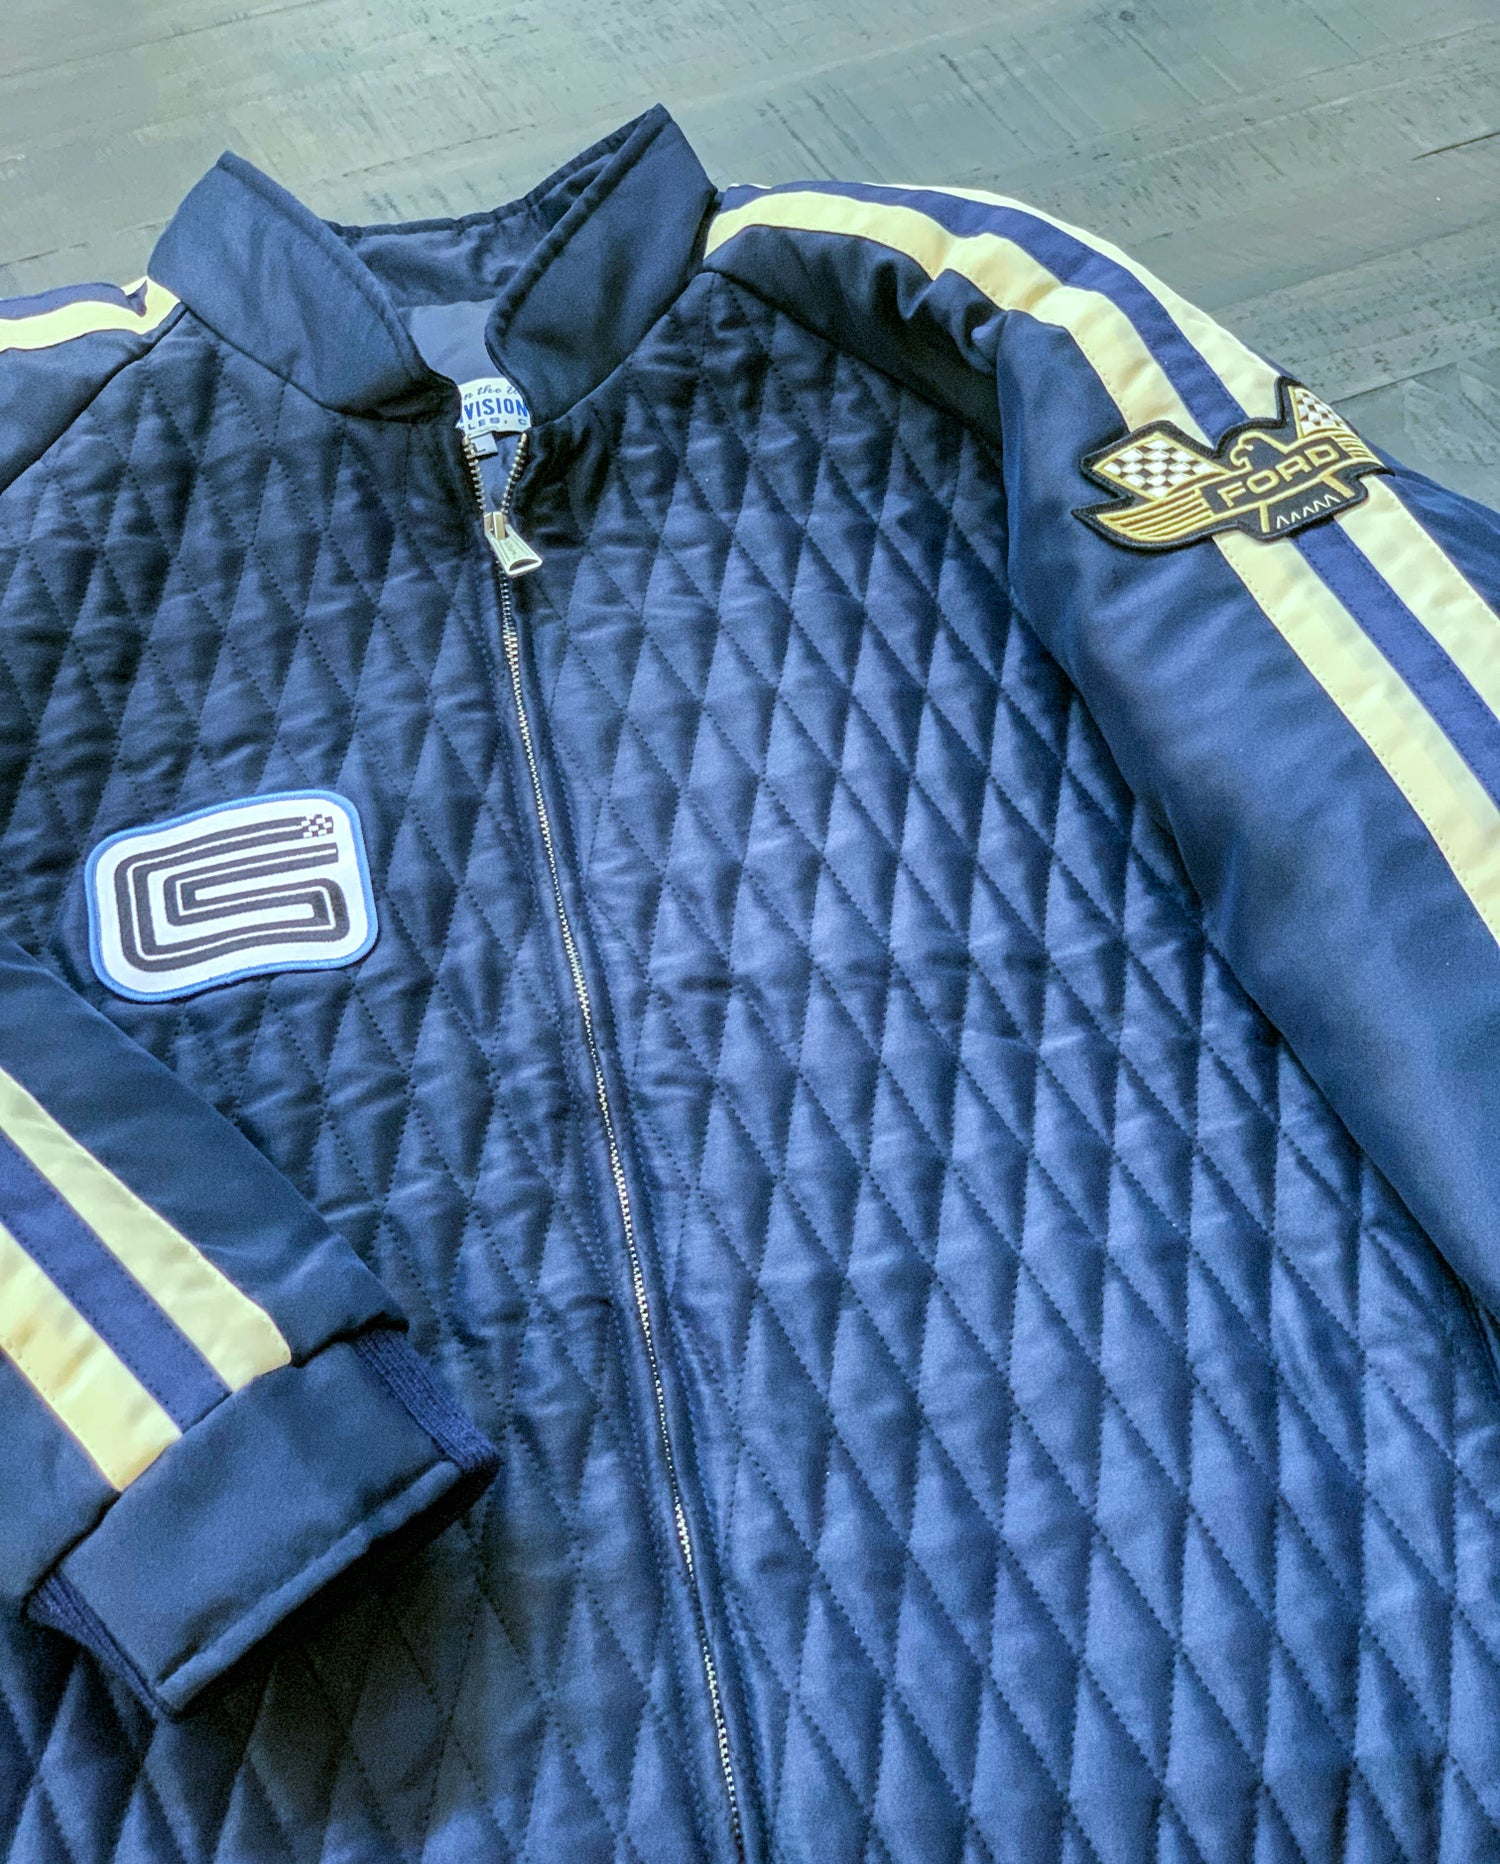 Image of OVC Presents - COBRA Crew Jacket - Blue, White Stripes COBRA Back